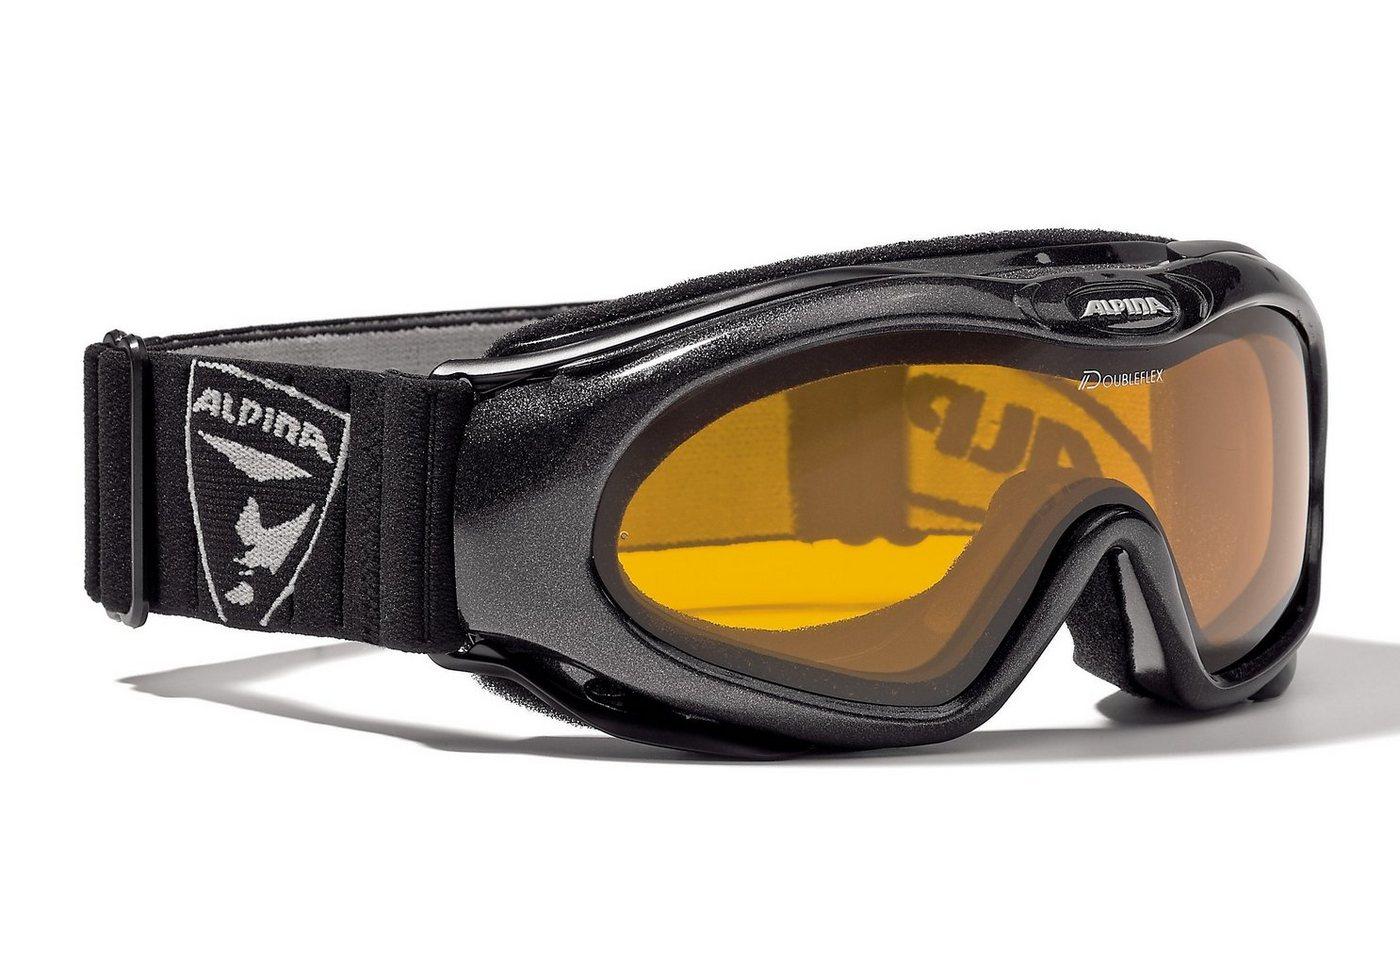 Skibrille, Alpina, »Bonfire A7015133« Sale Angebote Roggosen